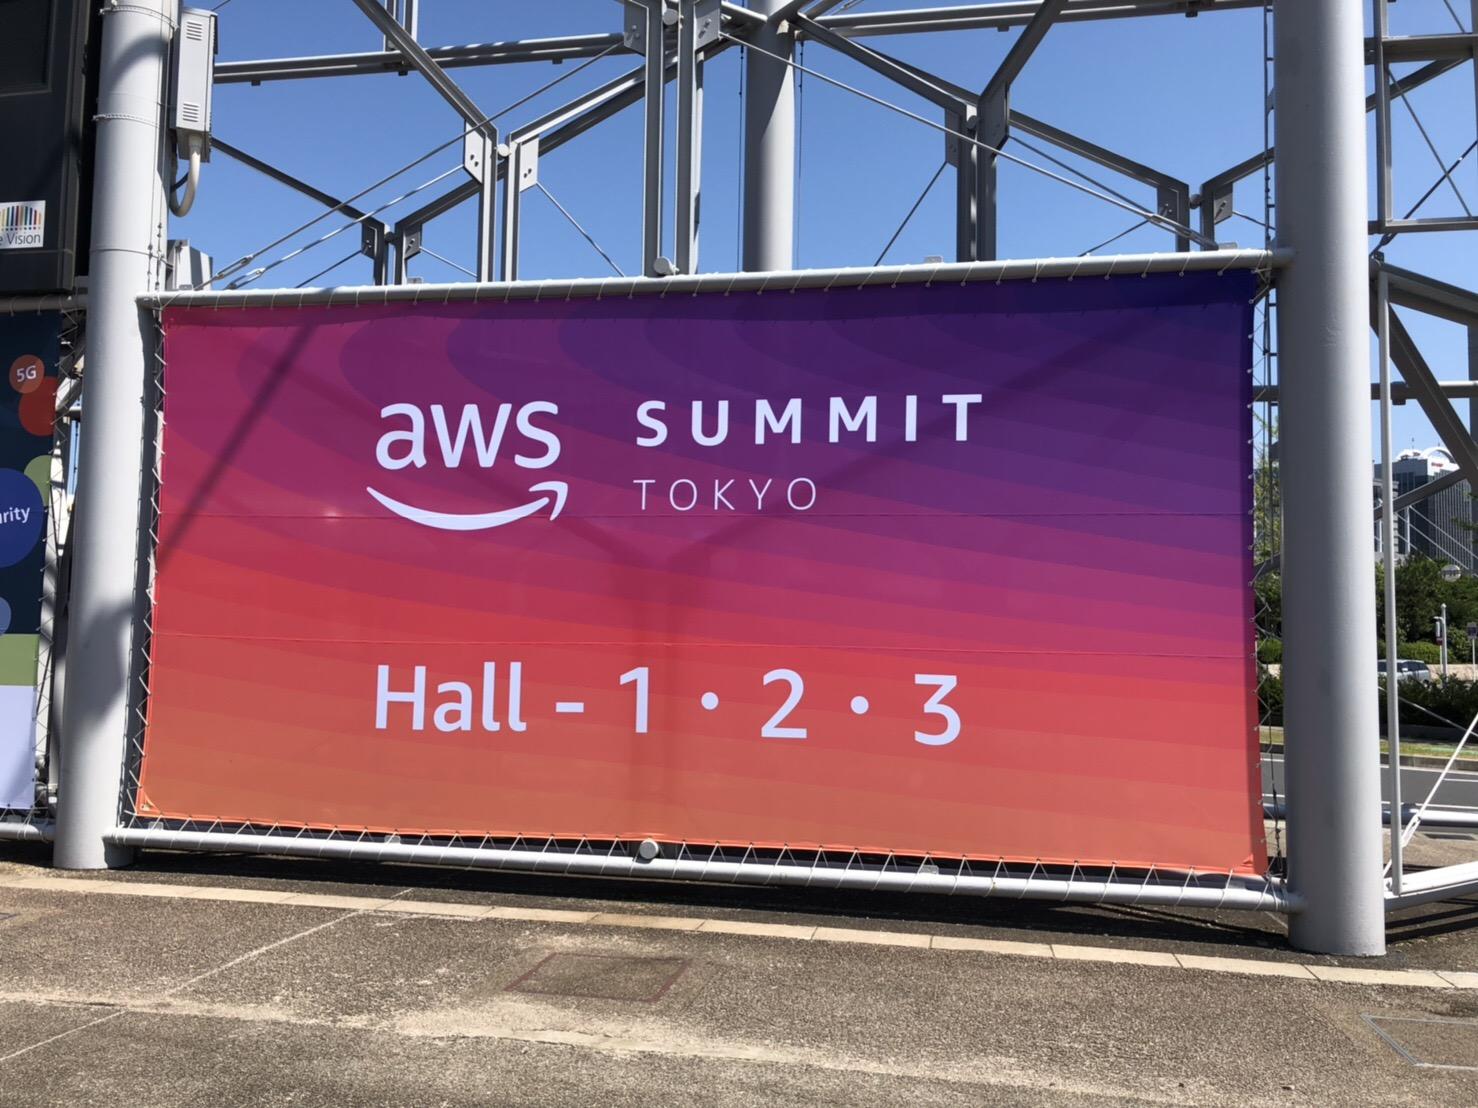 AWS Summit Tokyo 2019 2日目!